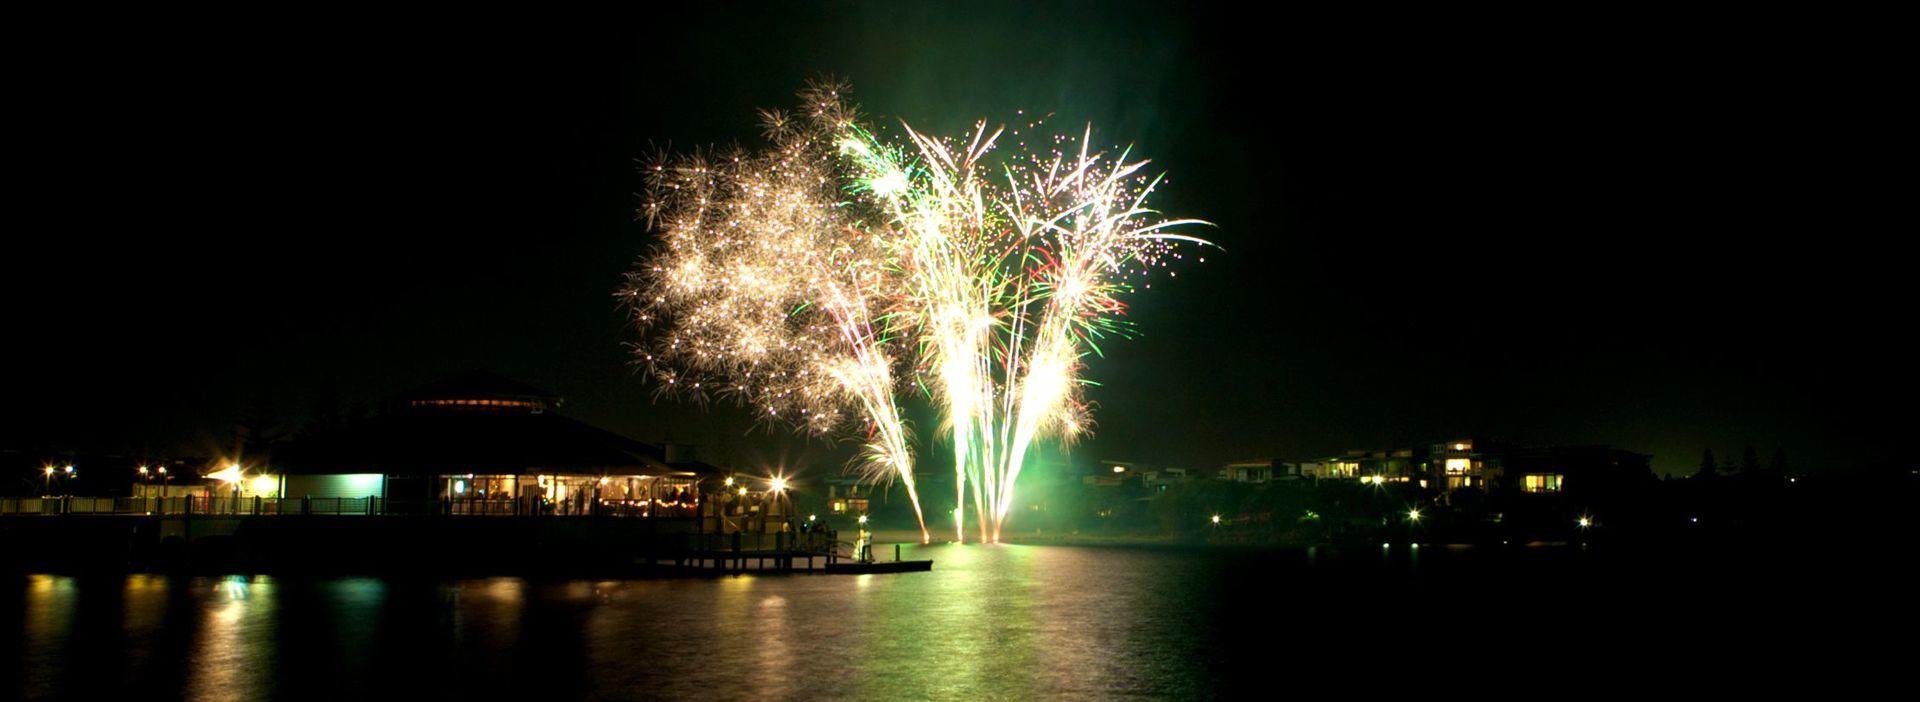 KCs Fireworks Displays | Fireworks Qld & NSW